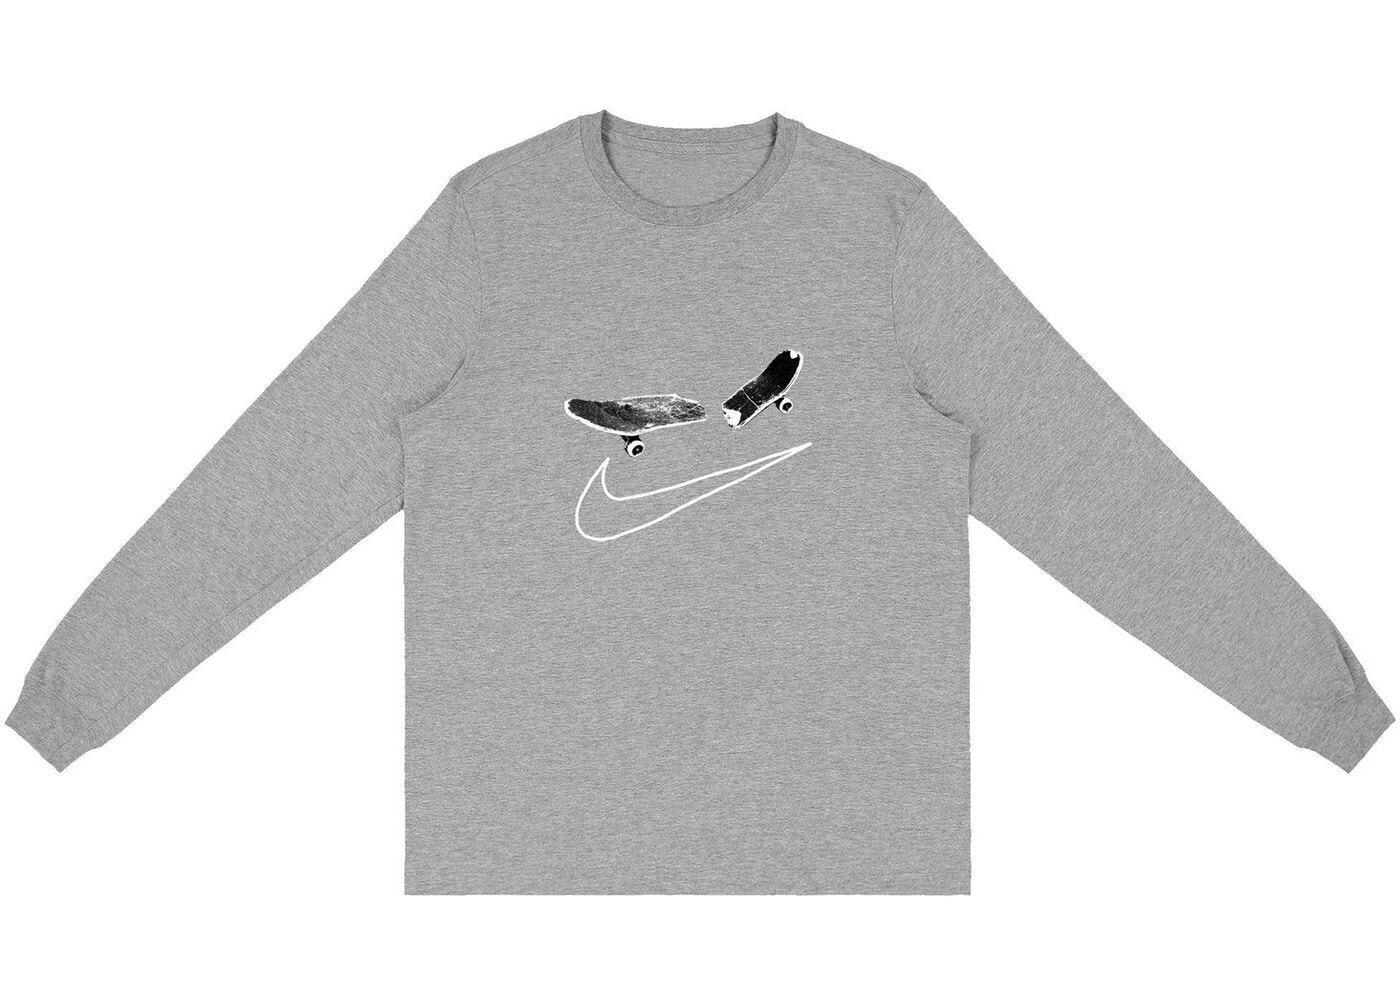 Travis Scott × Nike SB Cactus Jack For Longsleeve T-Shirt II Greyの写真